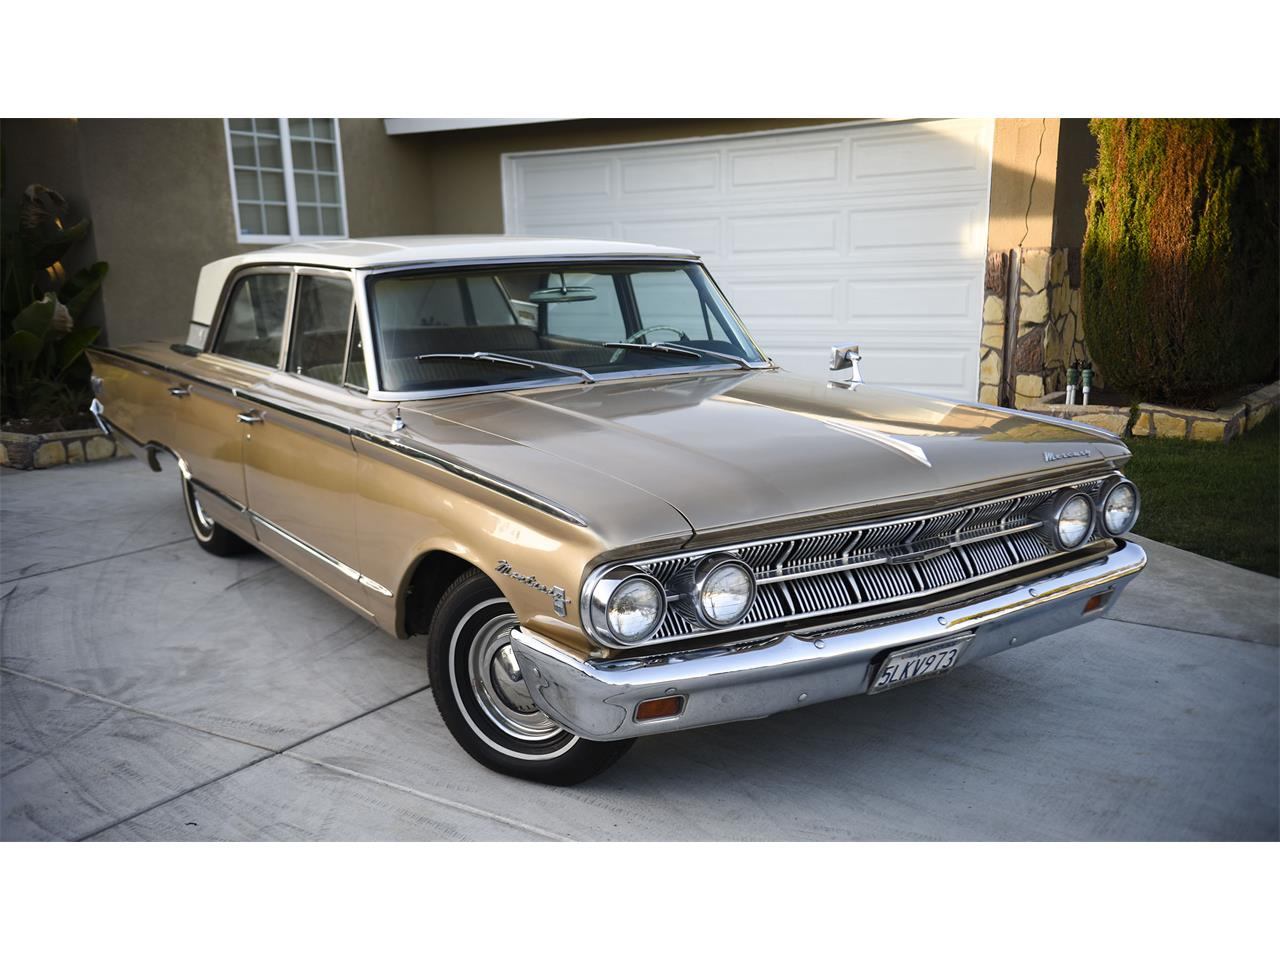 For Sale: 1963 Mercury Monterey in Gardena, California